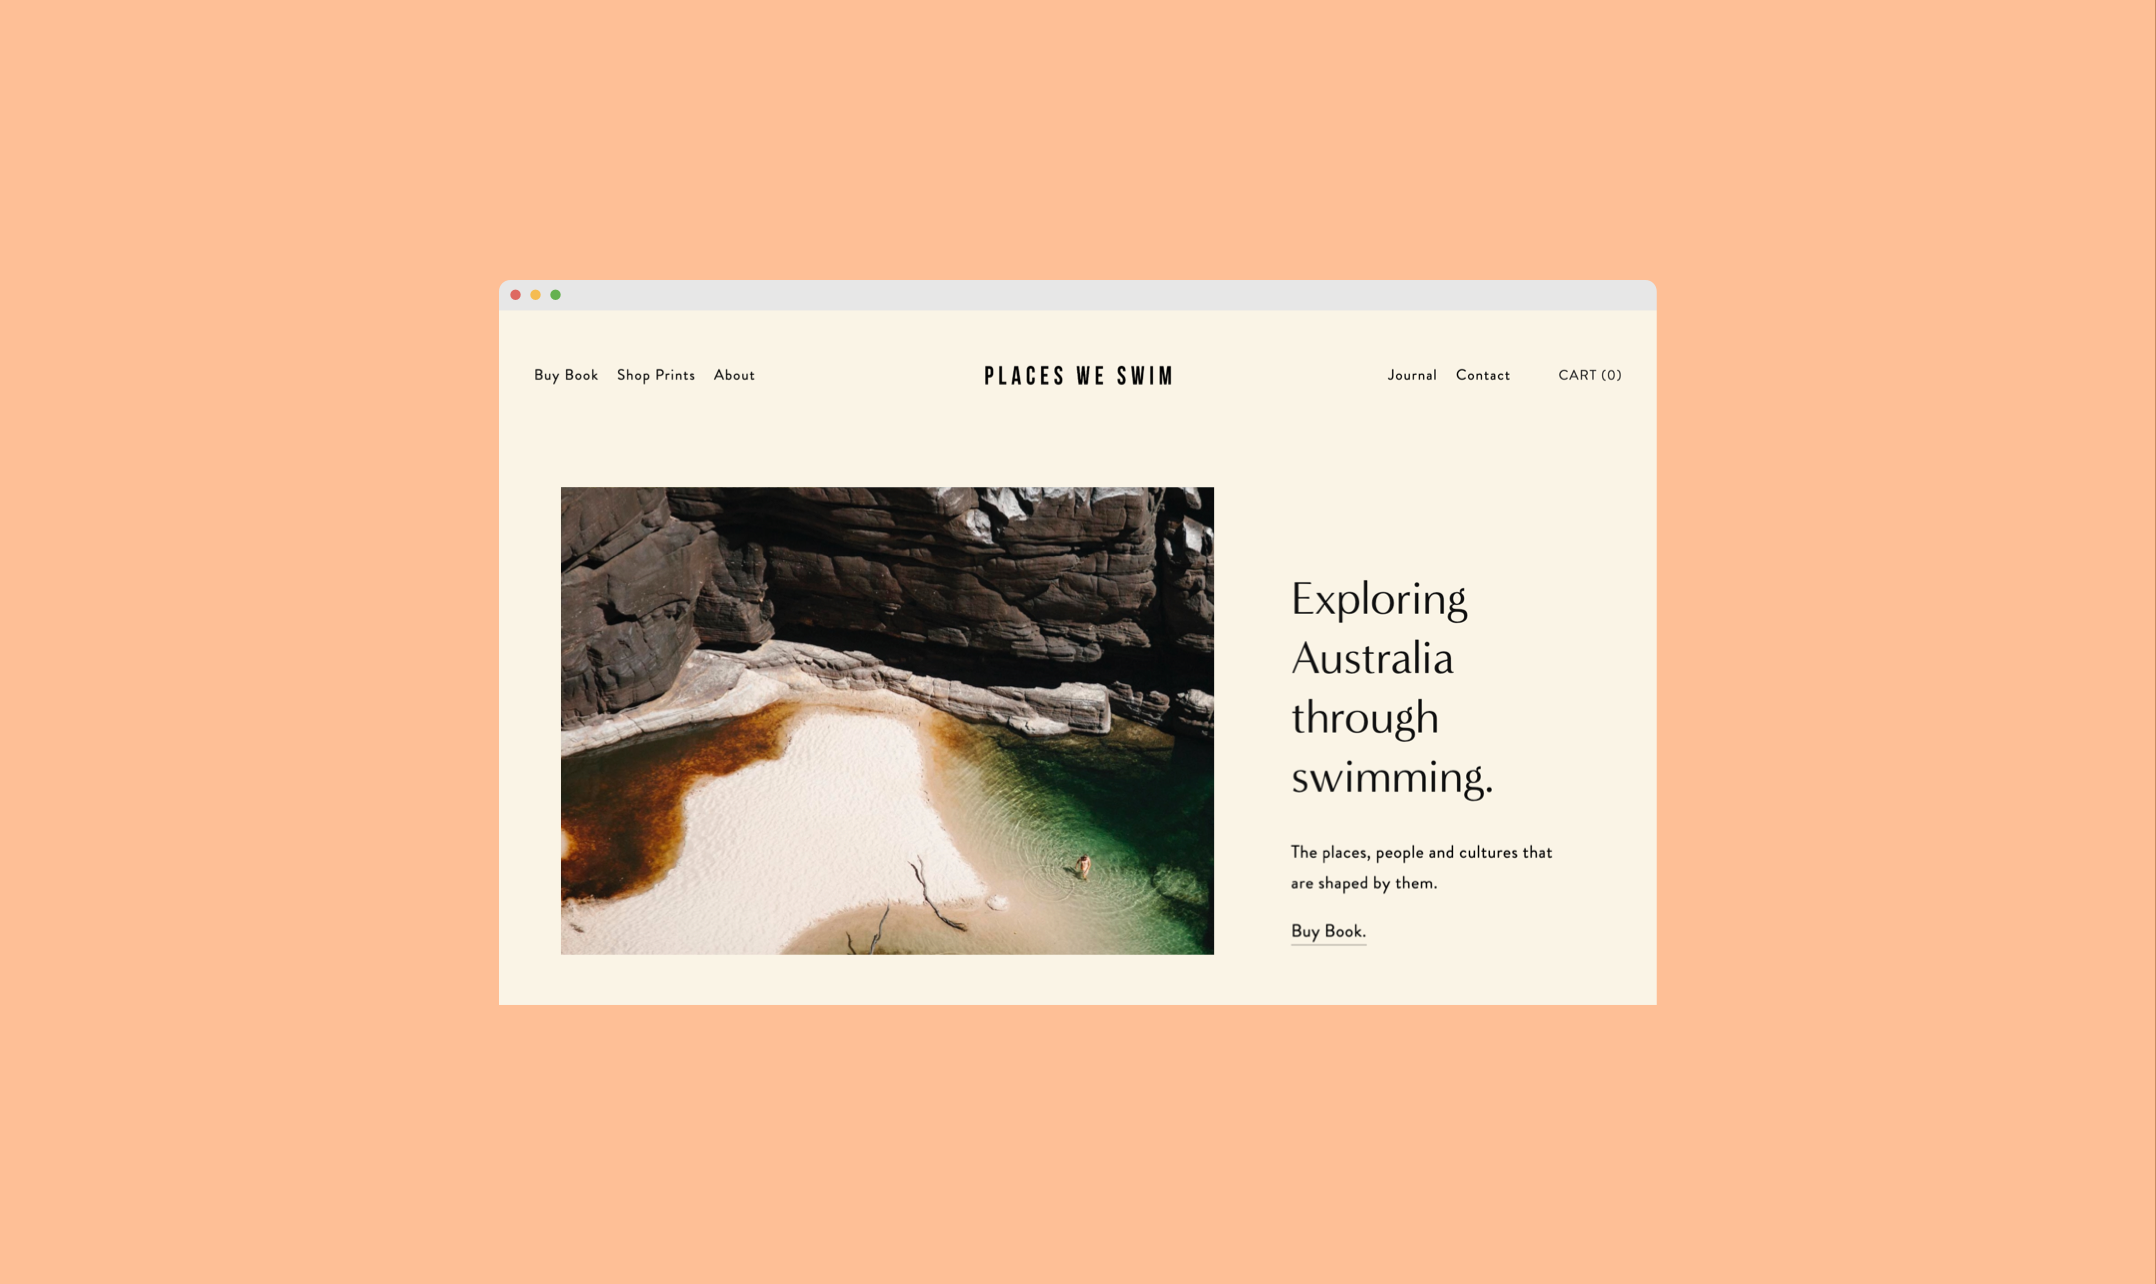 web-design-ethical-agency-swimmer-australia-travel-placesweswim-ethical-illustration-bondi-byron-bay-sydney-melbourne-branding.png